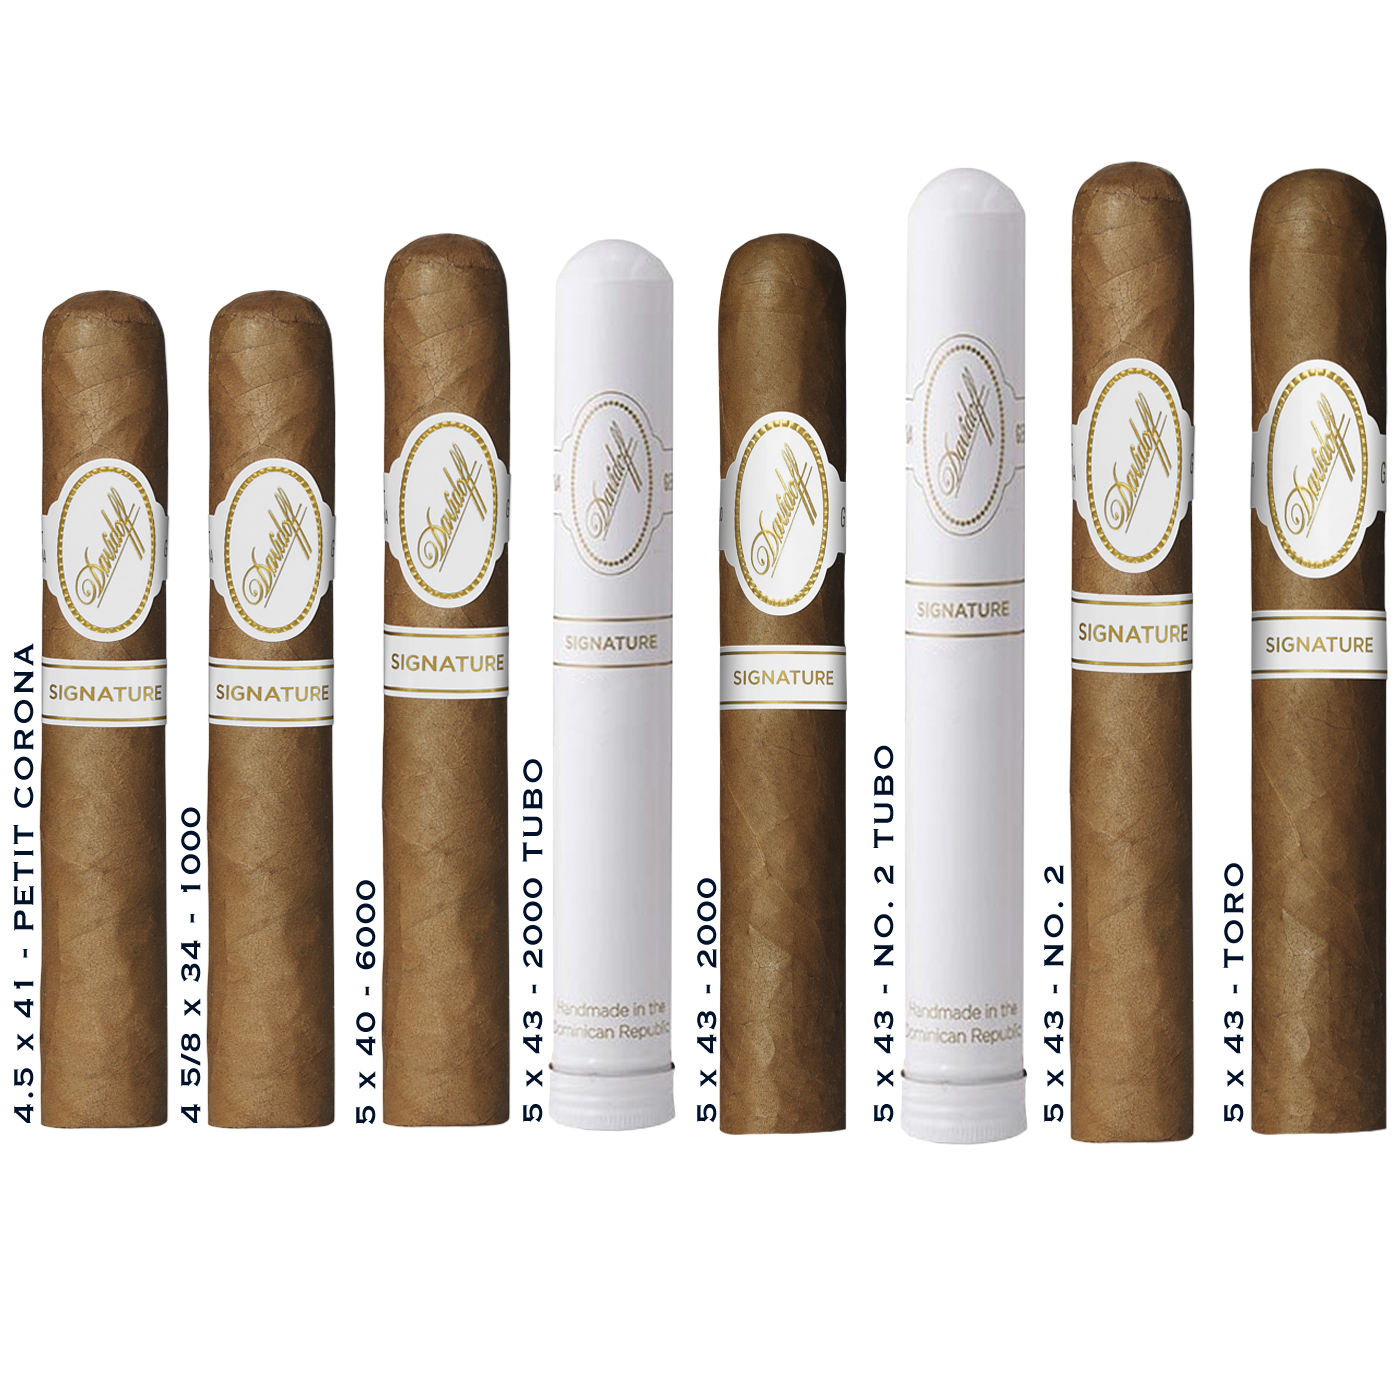 Davidoff Signature Cigars - Buy Premium Cigars Online From 2